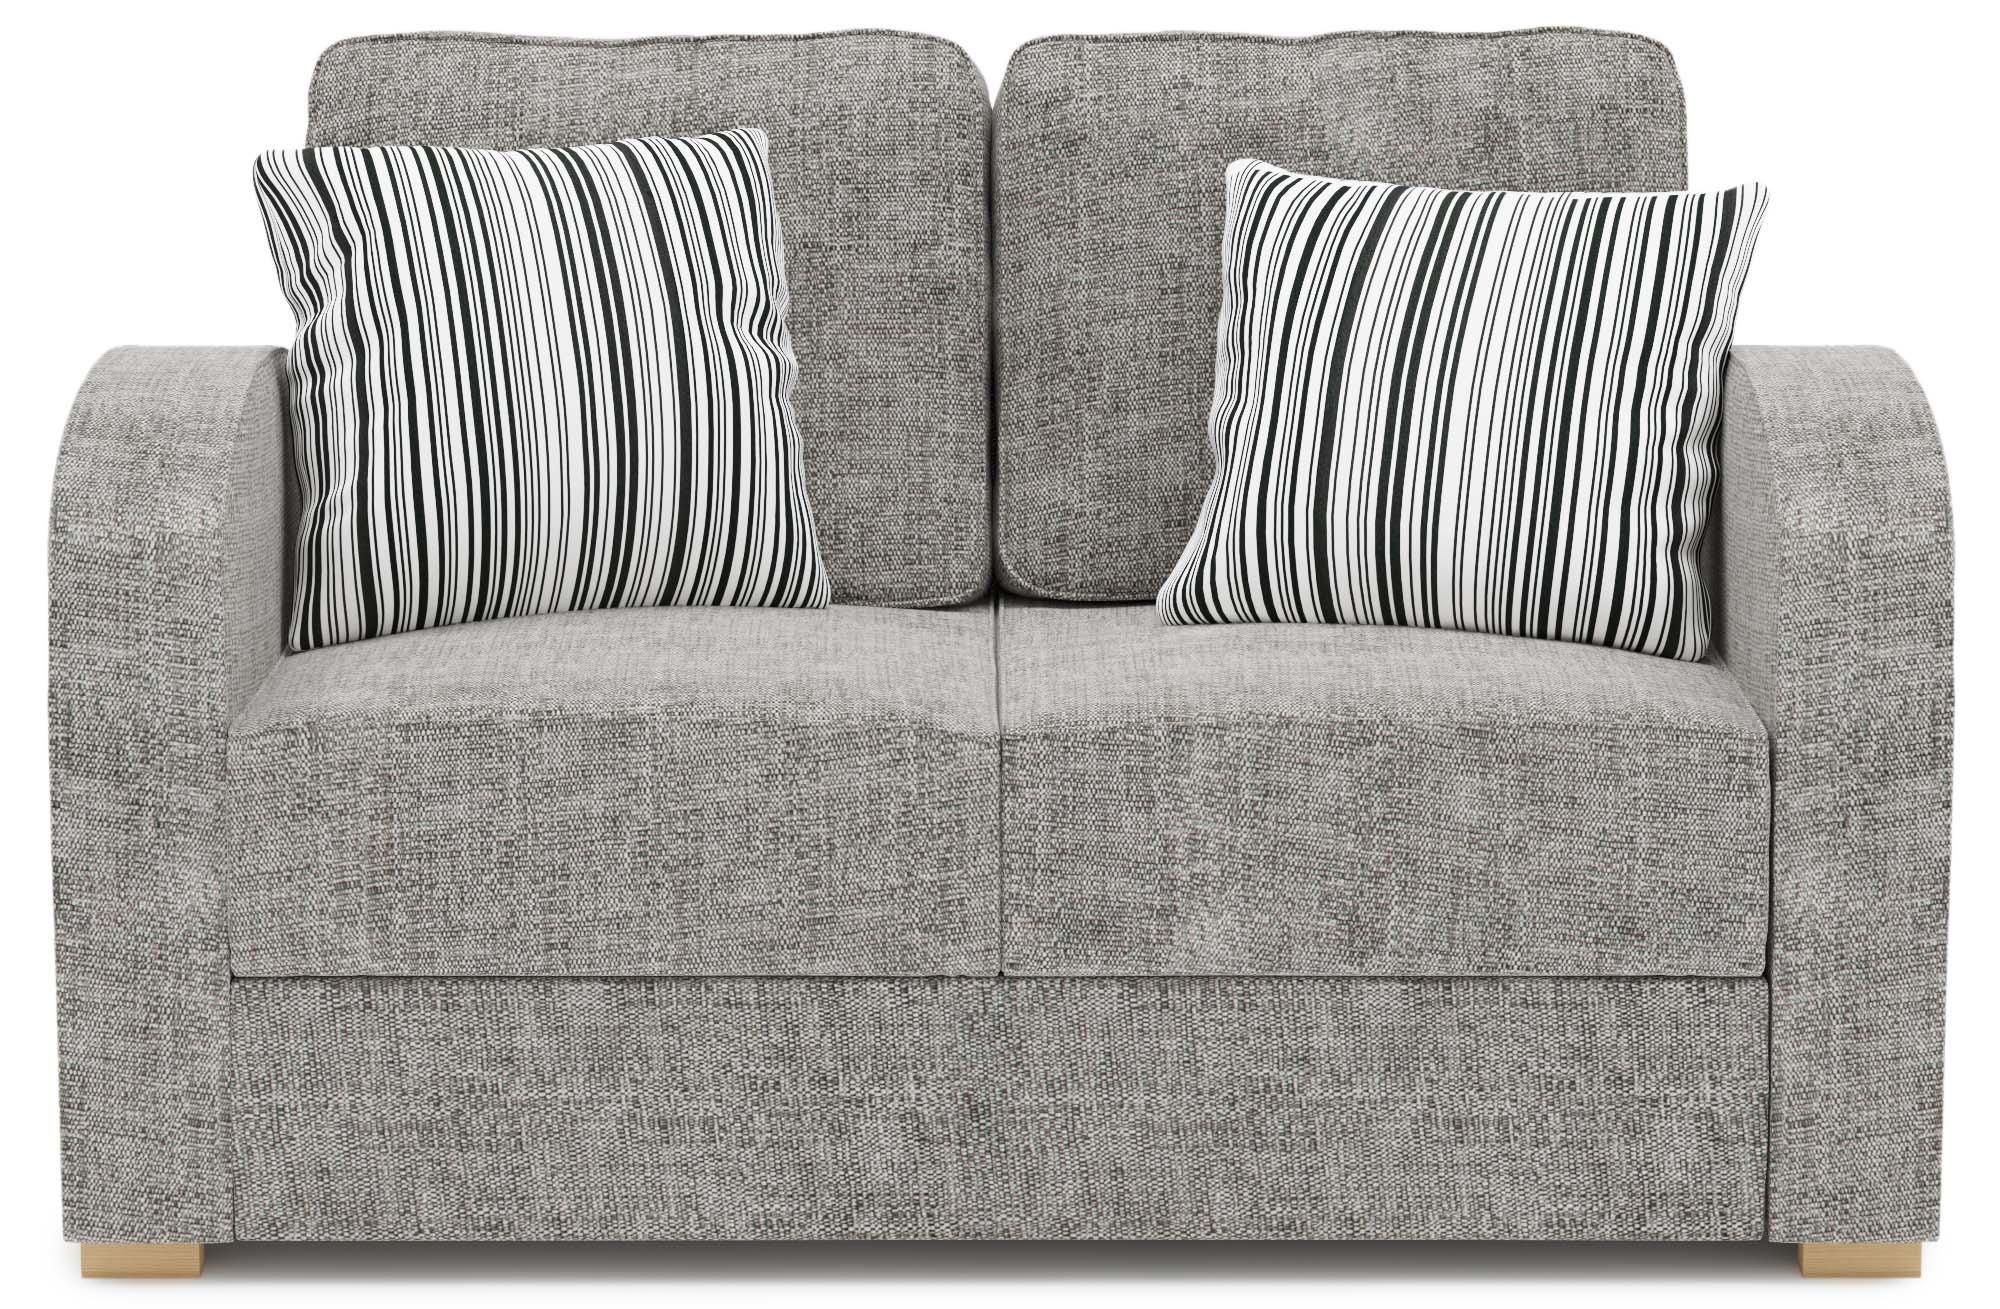 Orb 2 Seat Sofa